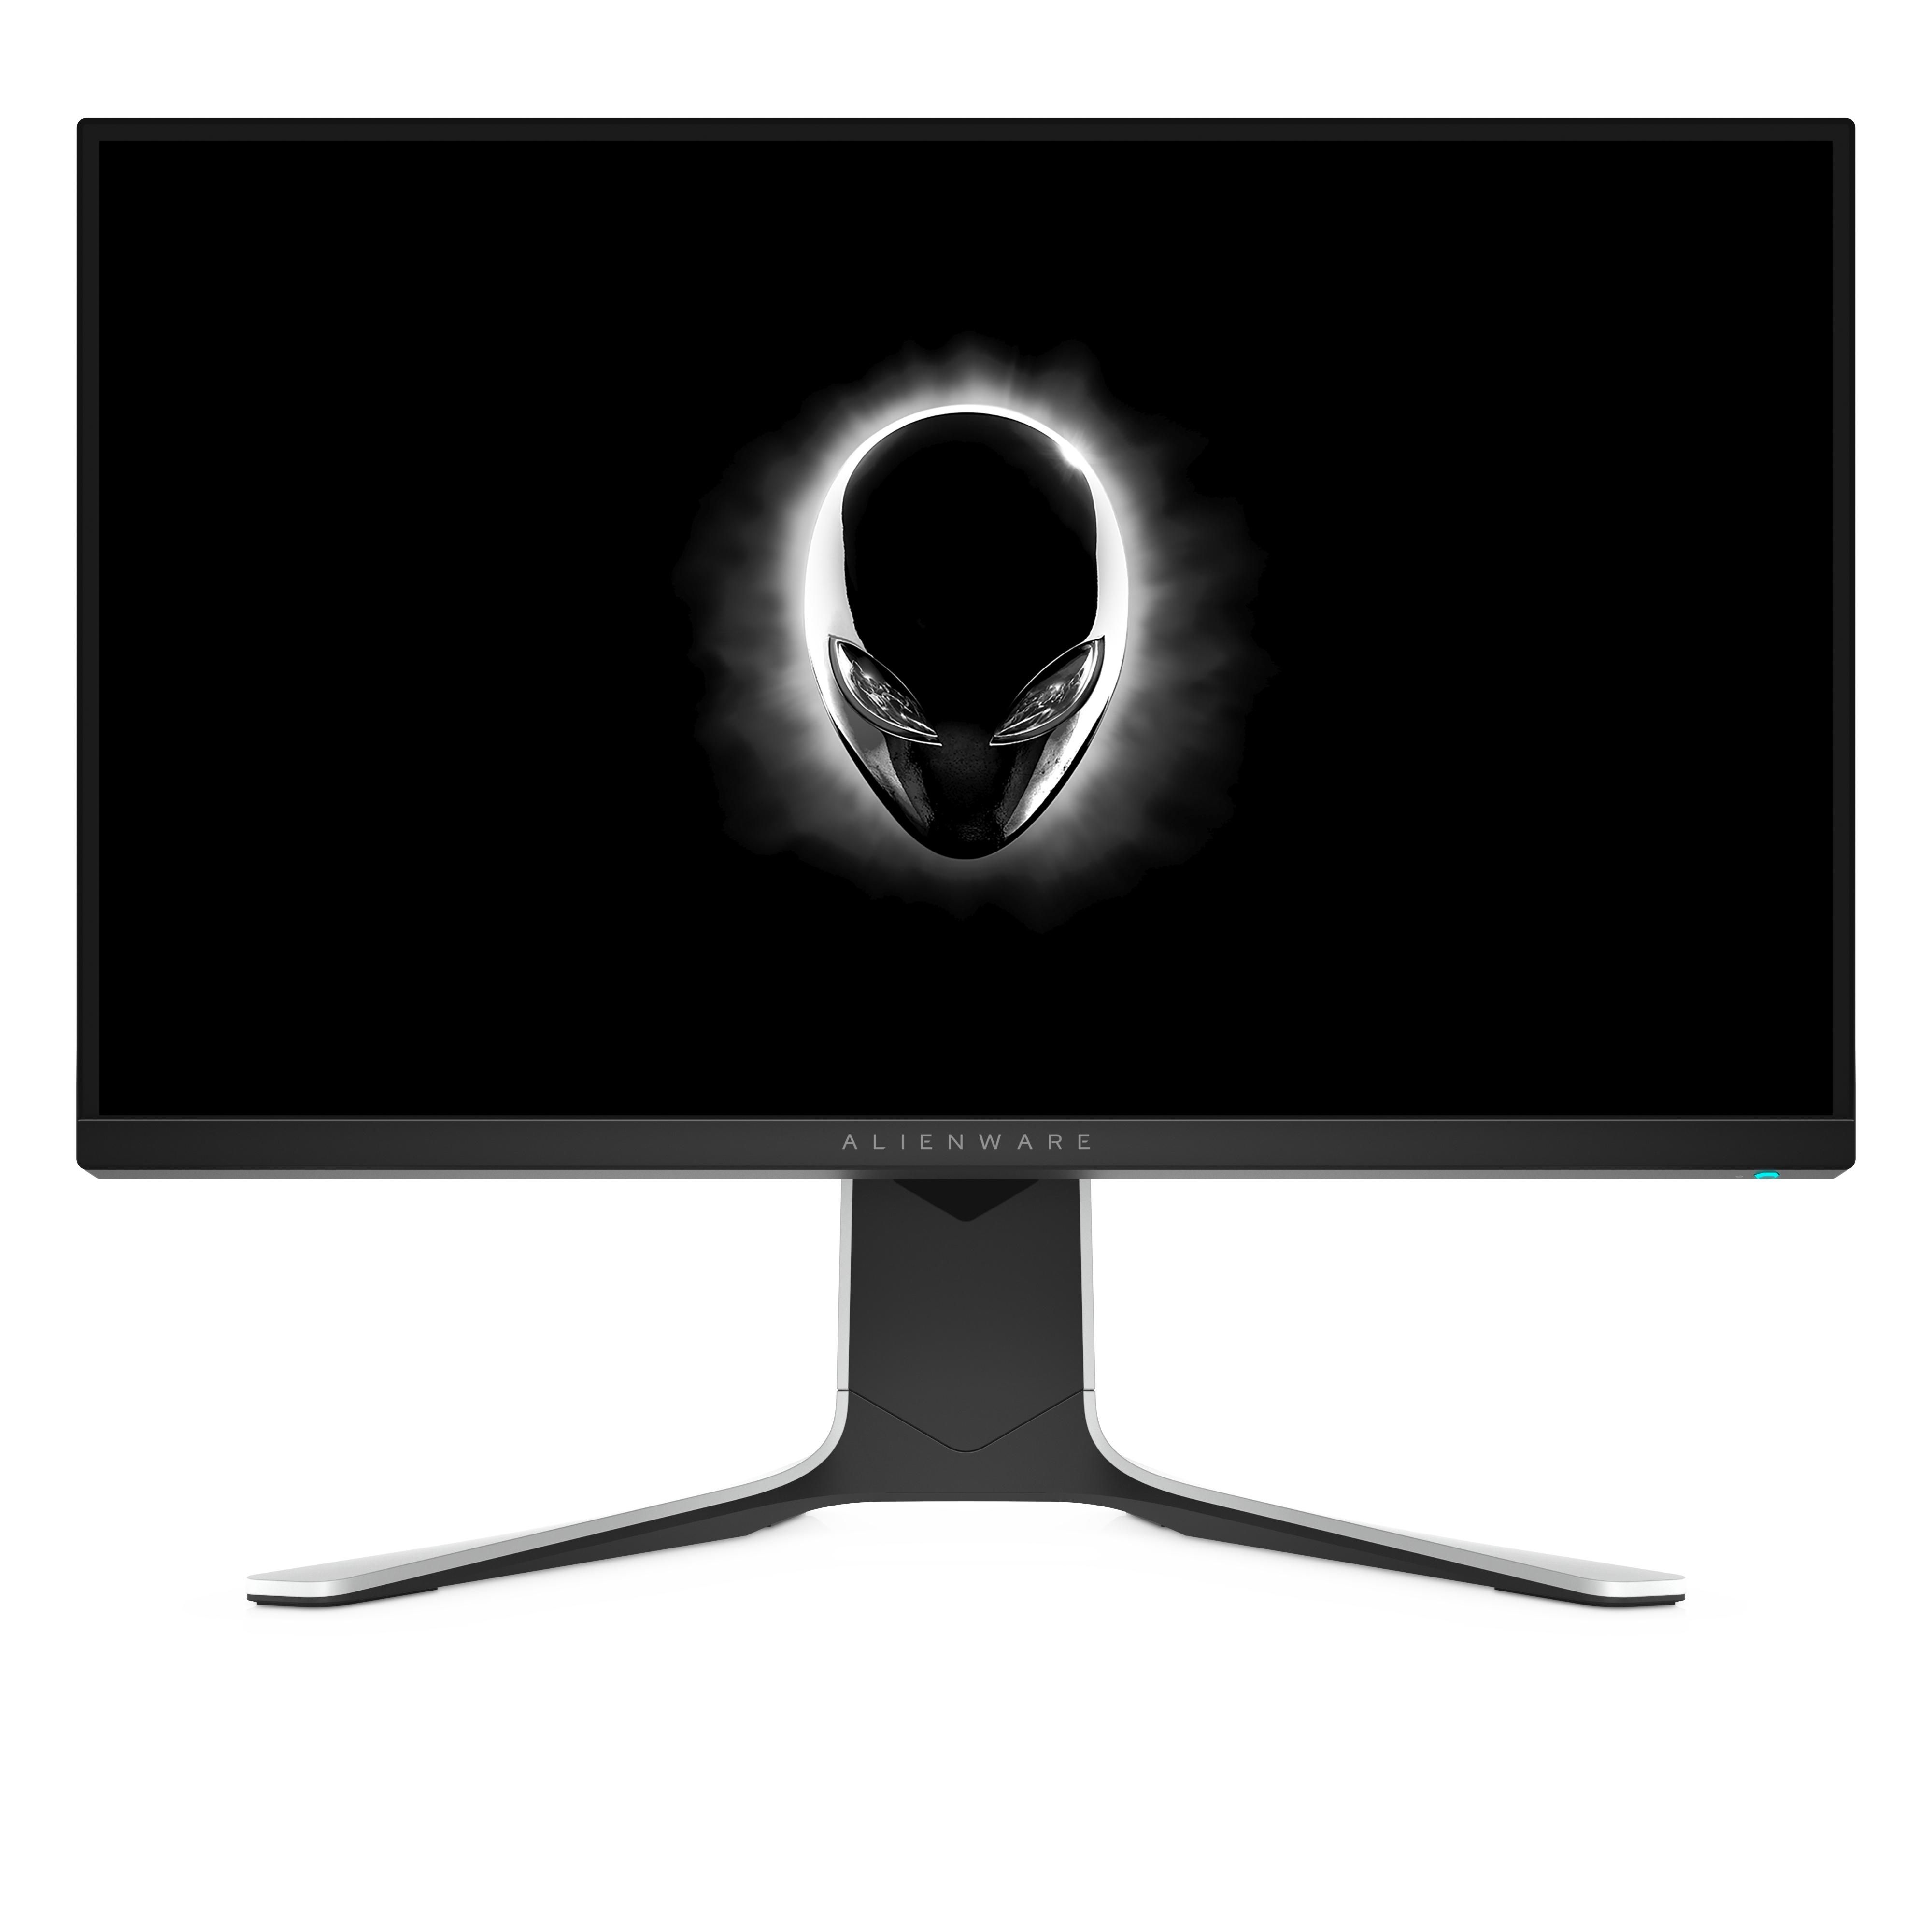 Vorschau: Dell Alienware AW2720HF - 68,6 cm (27 Zoll) - 1920 x 1080 Pixel - Full HD - LCD - 1 ms - Schwarz - Weiß